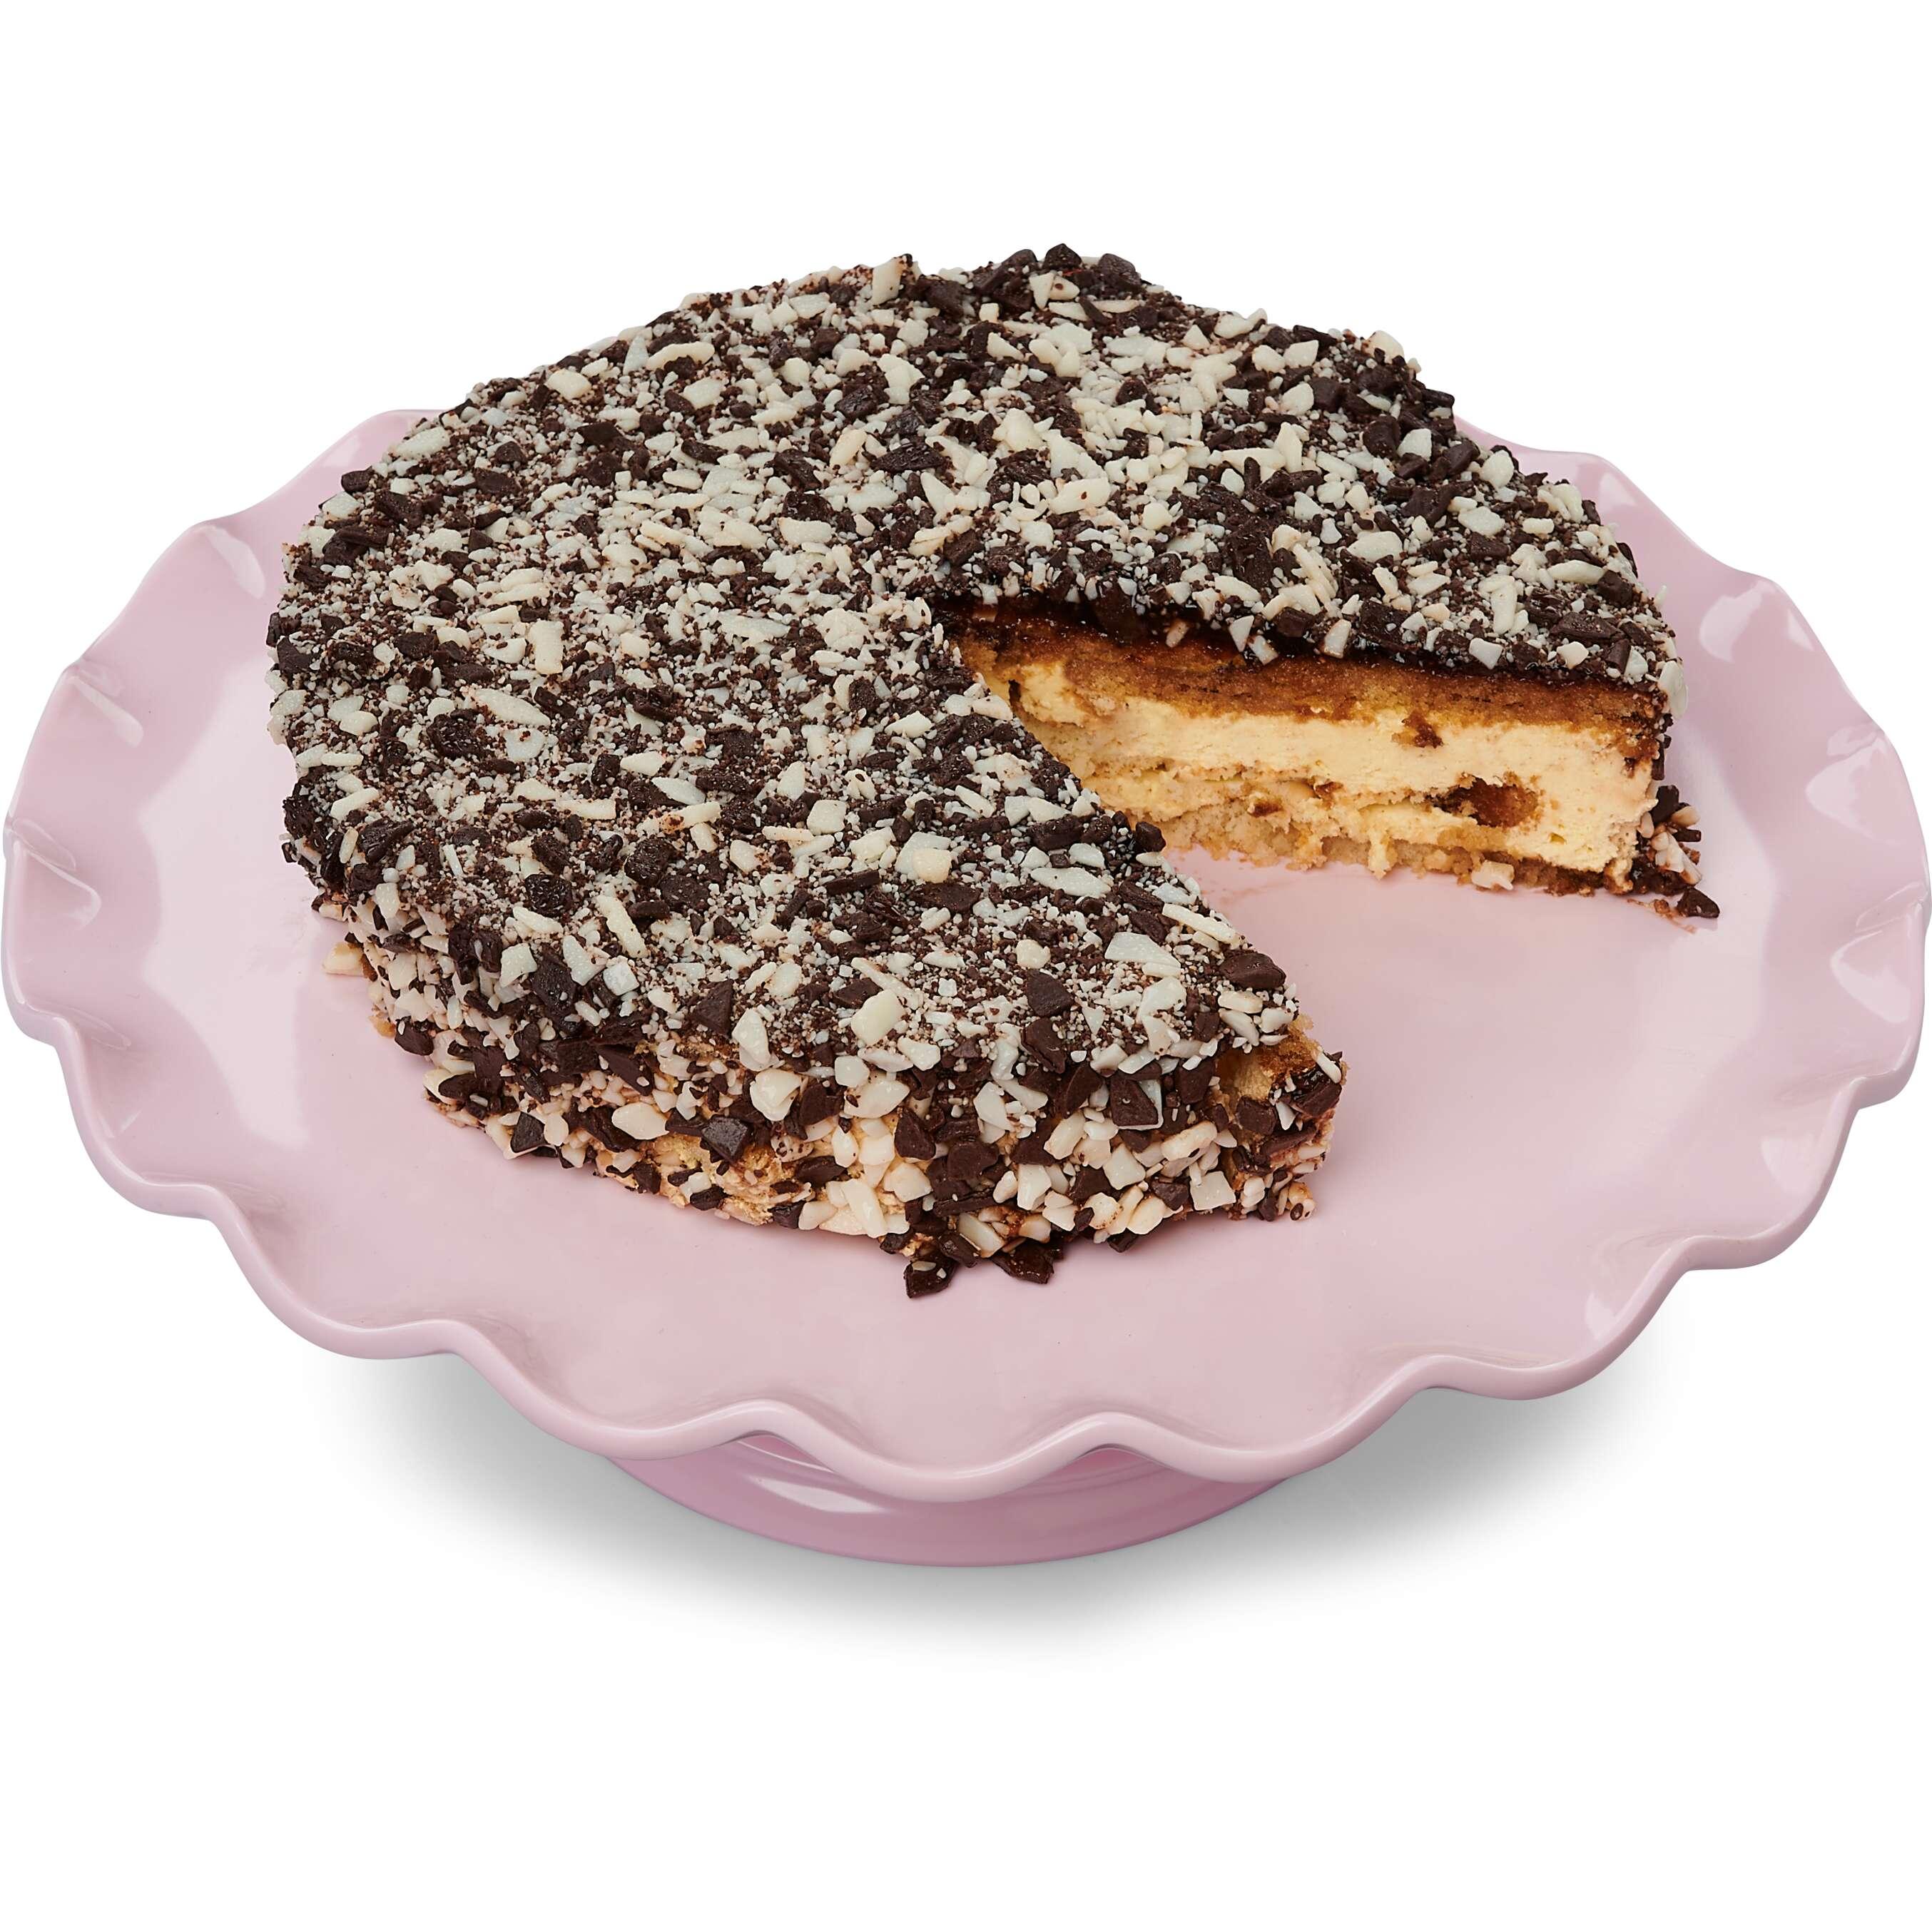 Изображение за продукта Елей Домашна бисквитена торта